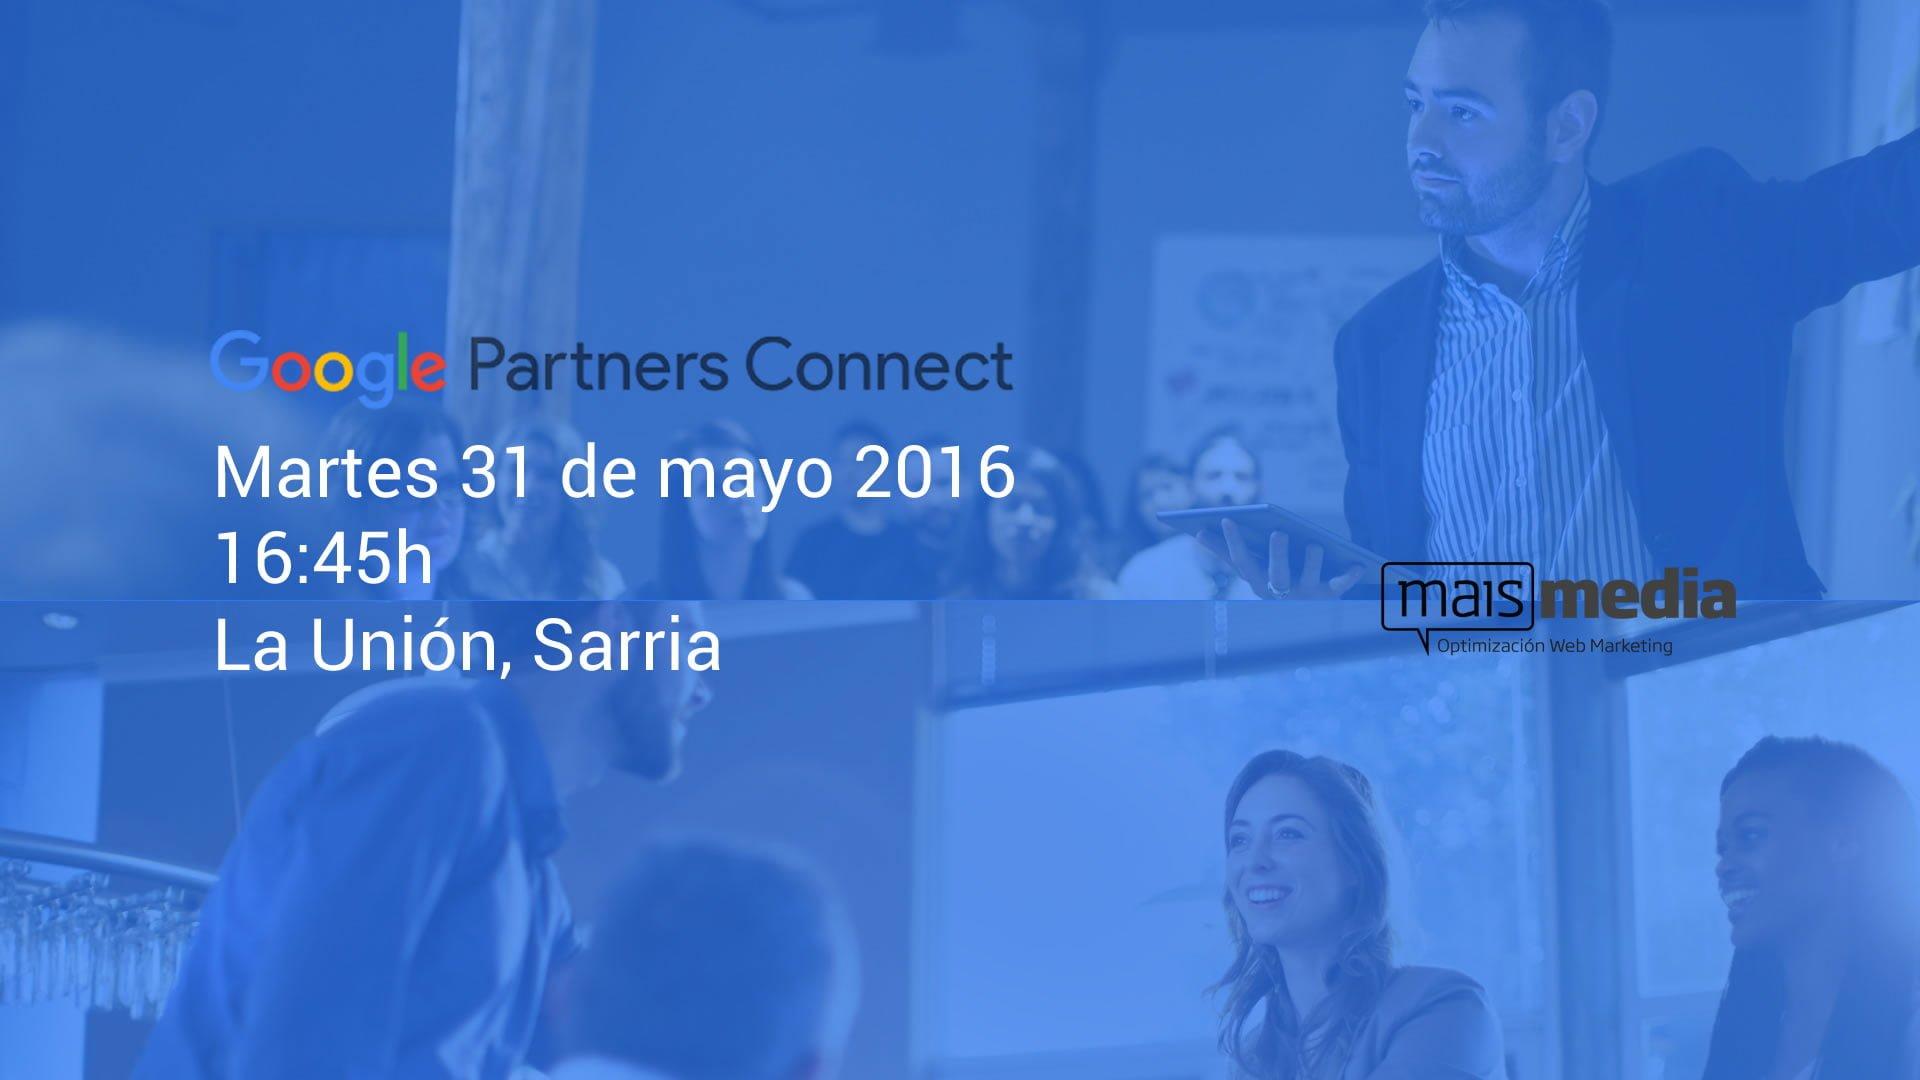 Google Partners Connect: Sarria, Lugo